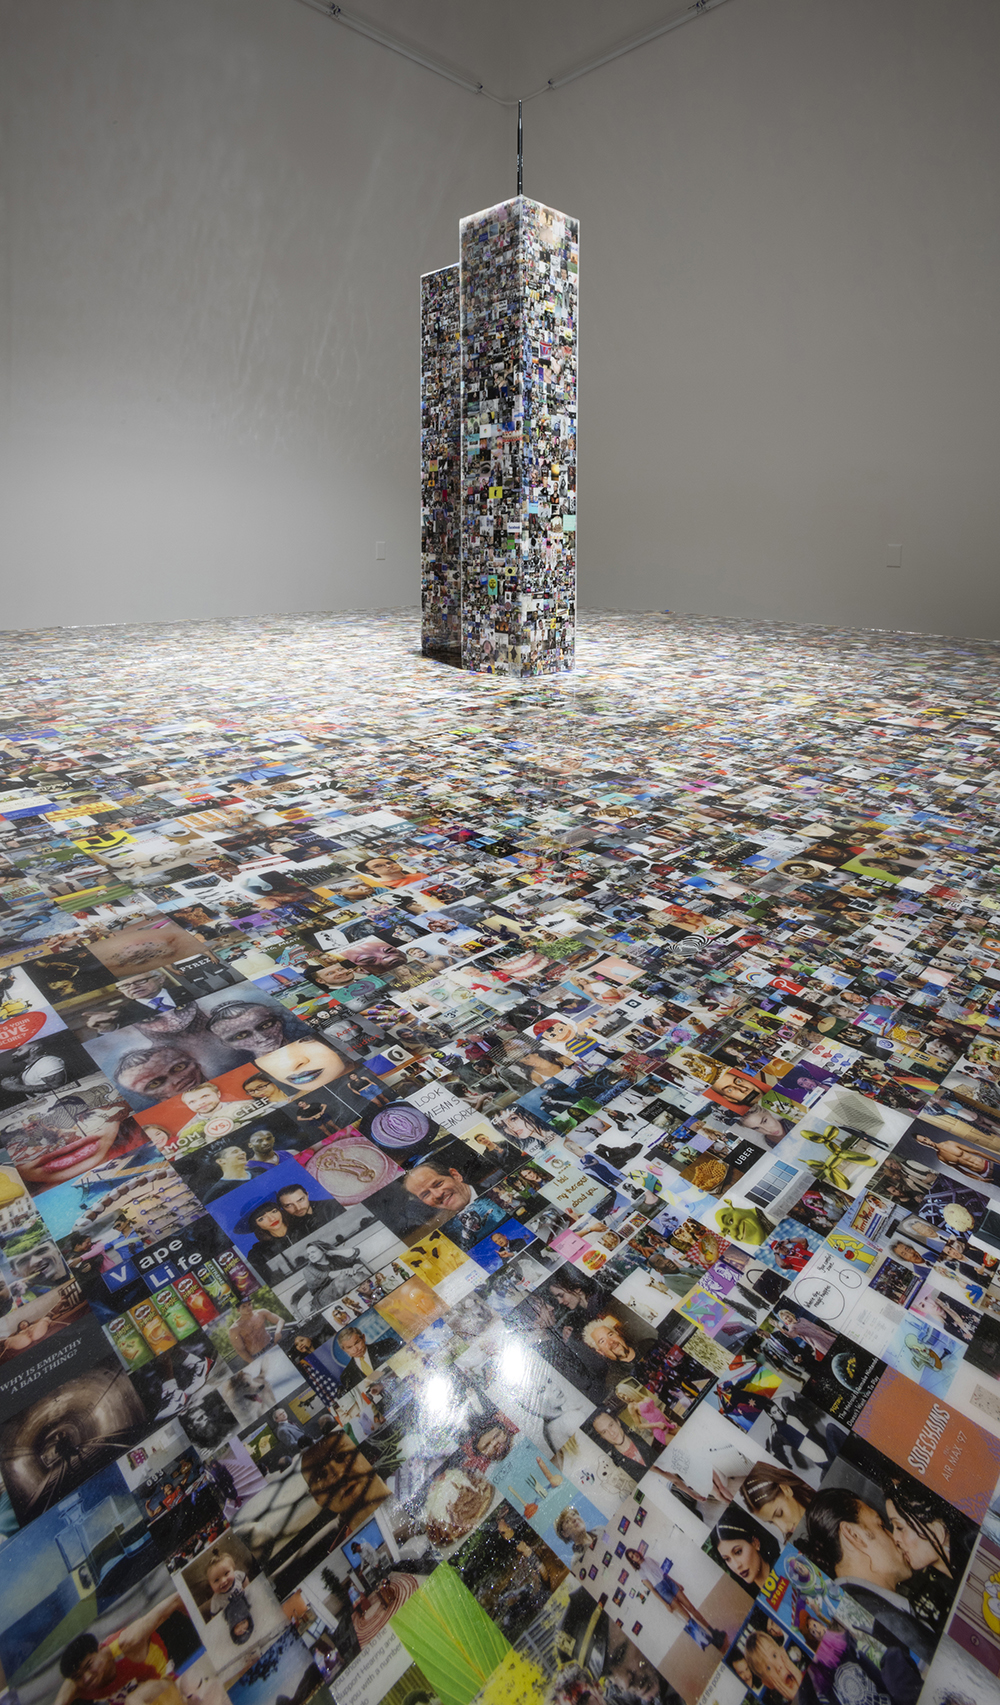 Ryder Ripps, net art, web art, internet, 9/11, barbara lee, steve turner, los angeles installtion, images, dump.fm, adrienne ho